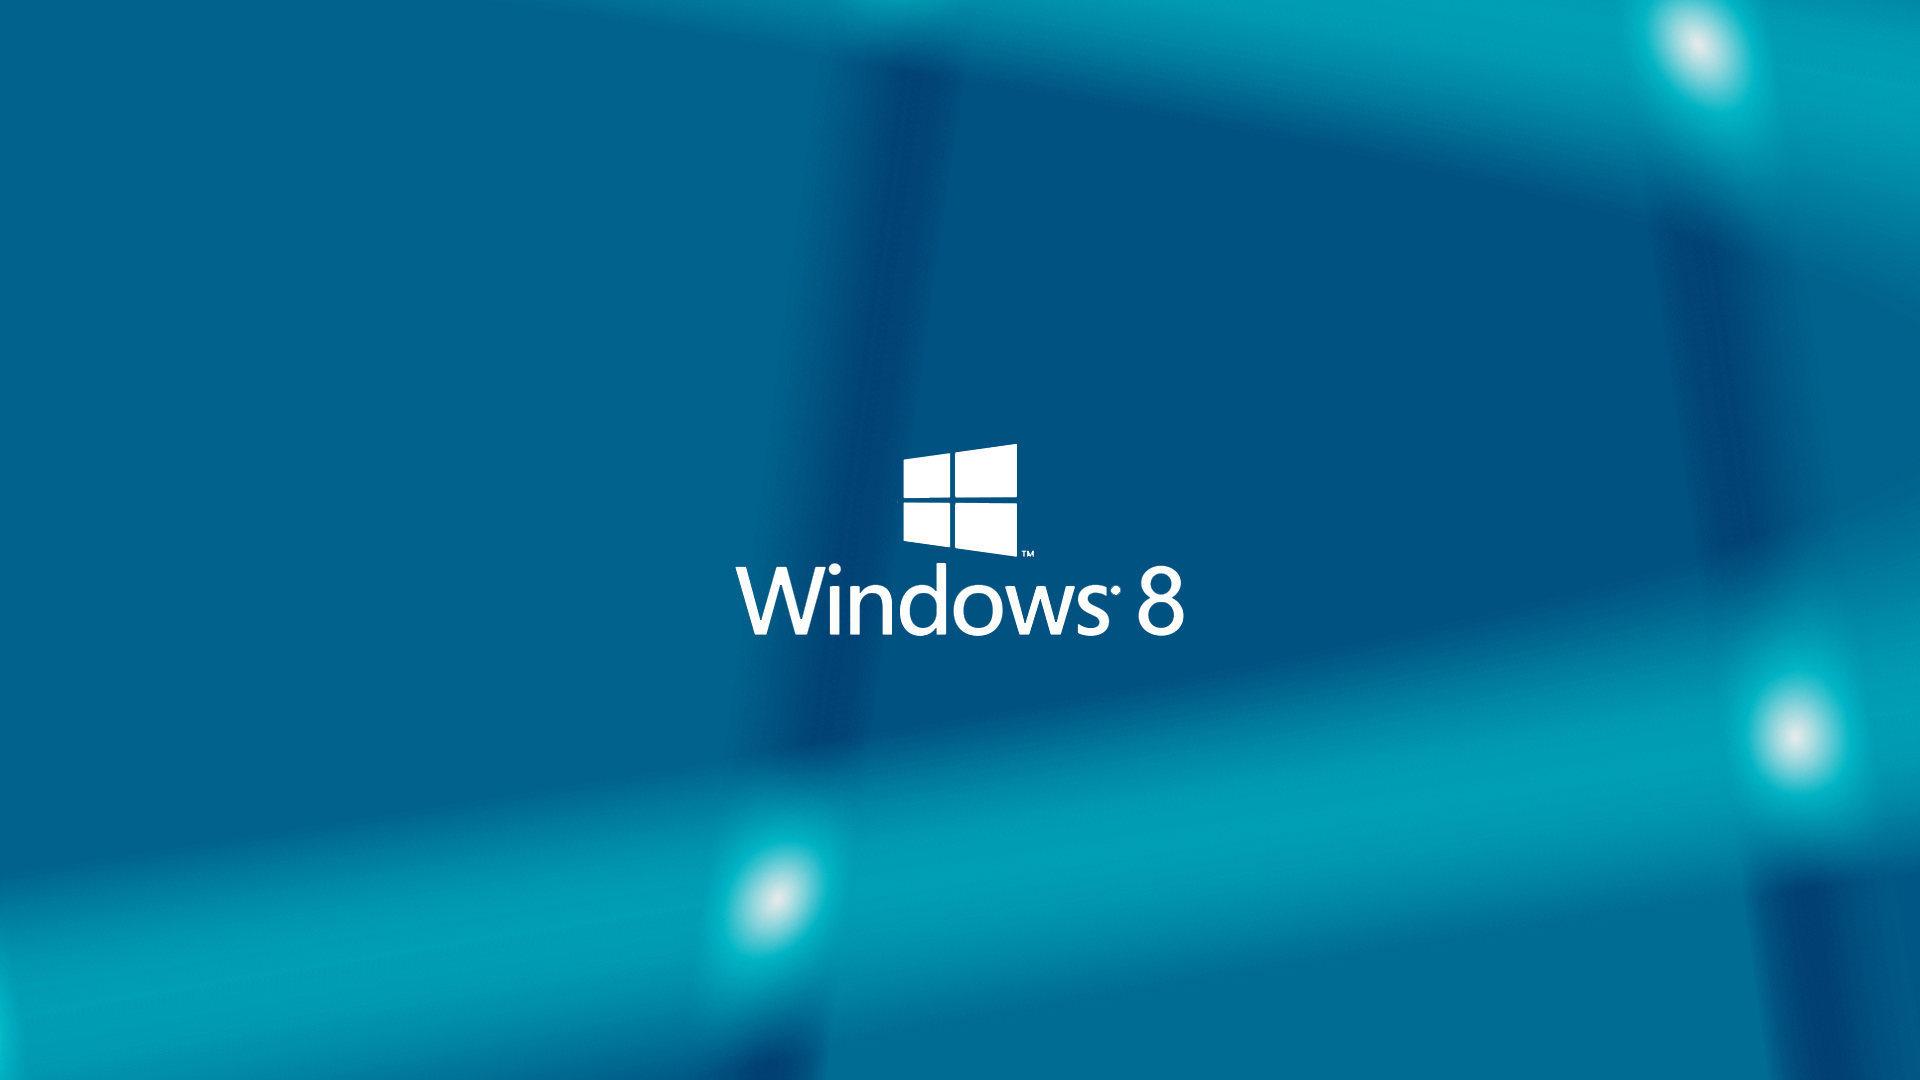 1920x1080px Windows 8 Wallpaper Download 1920x1080